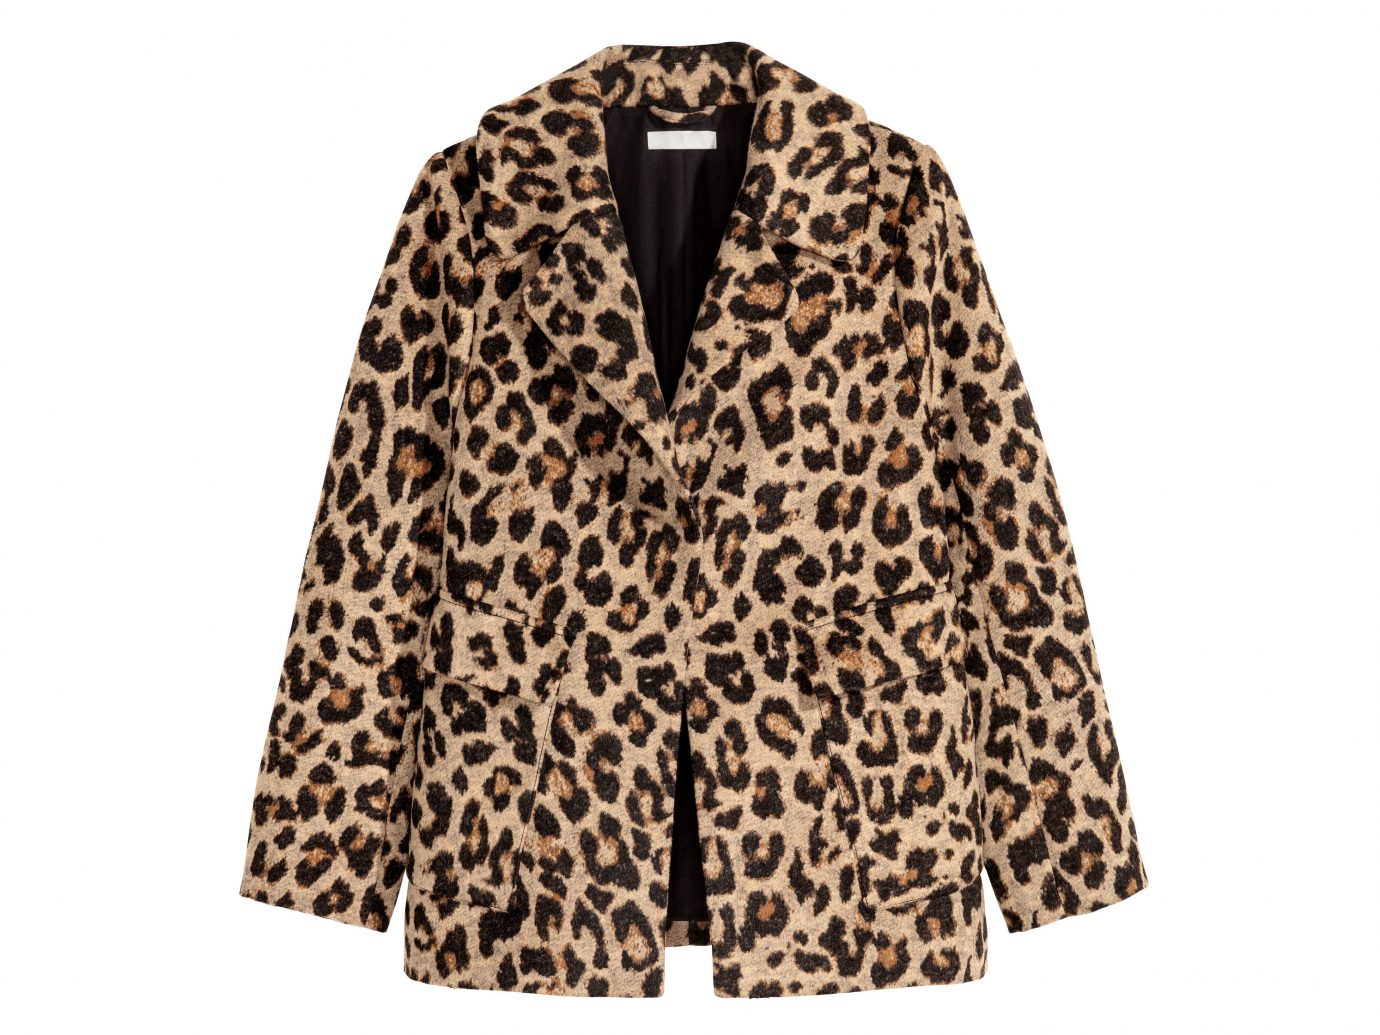 Style + Design clothing jacket outerwear coat sleeve fur costume blazer pattern textile collar